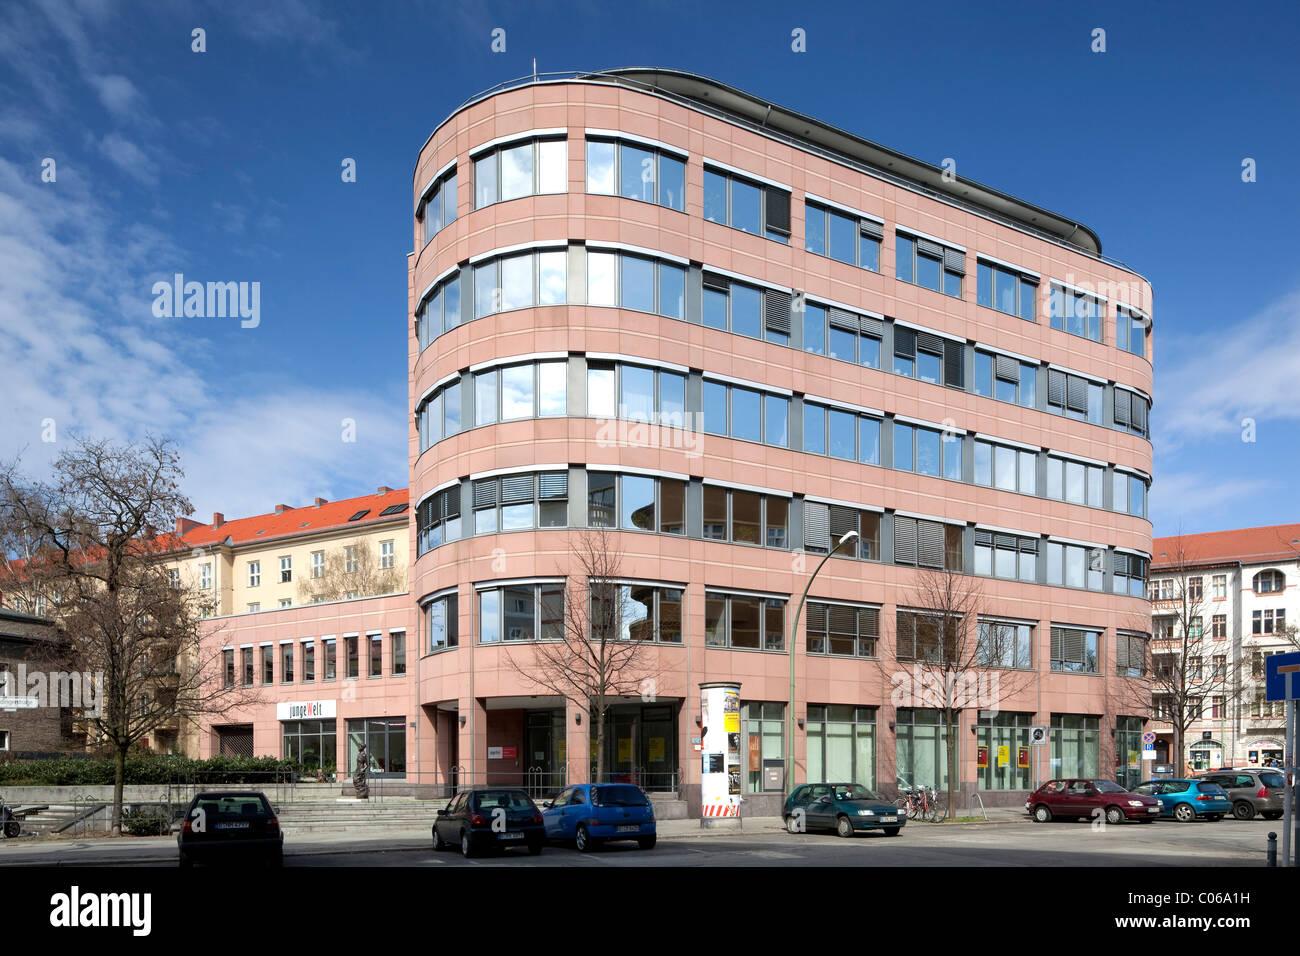 Prédio de Escritórios, Torstrasse, editorial office de Junge Welt jornal, Berlin-Mitte, Berlim, Alemanha, Imagens de Stock